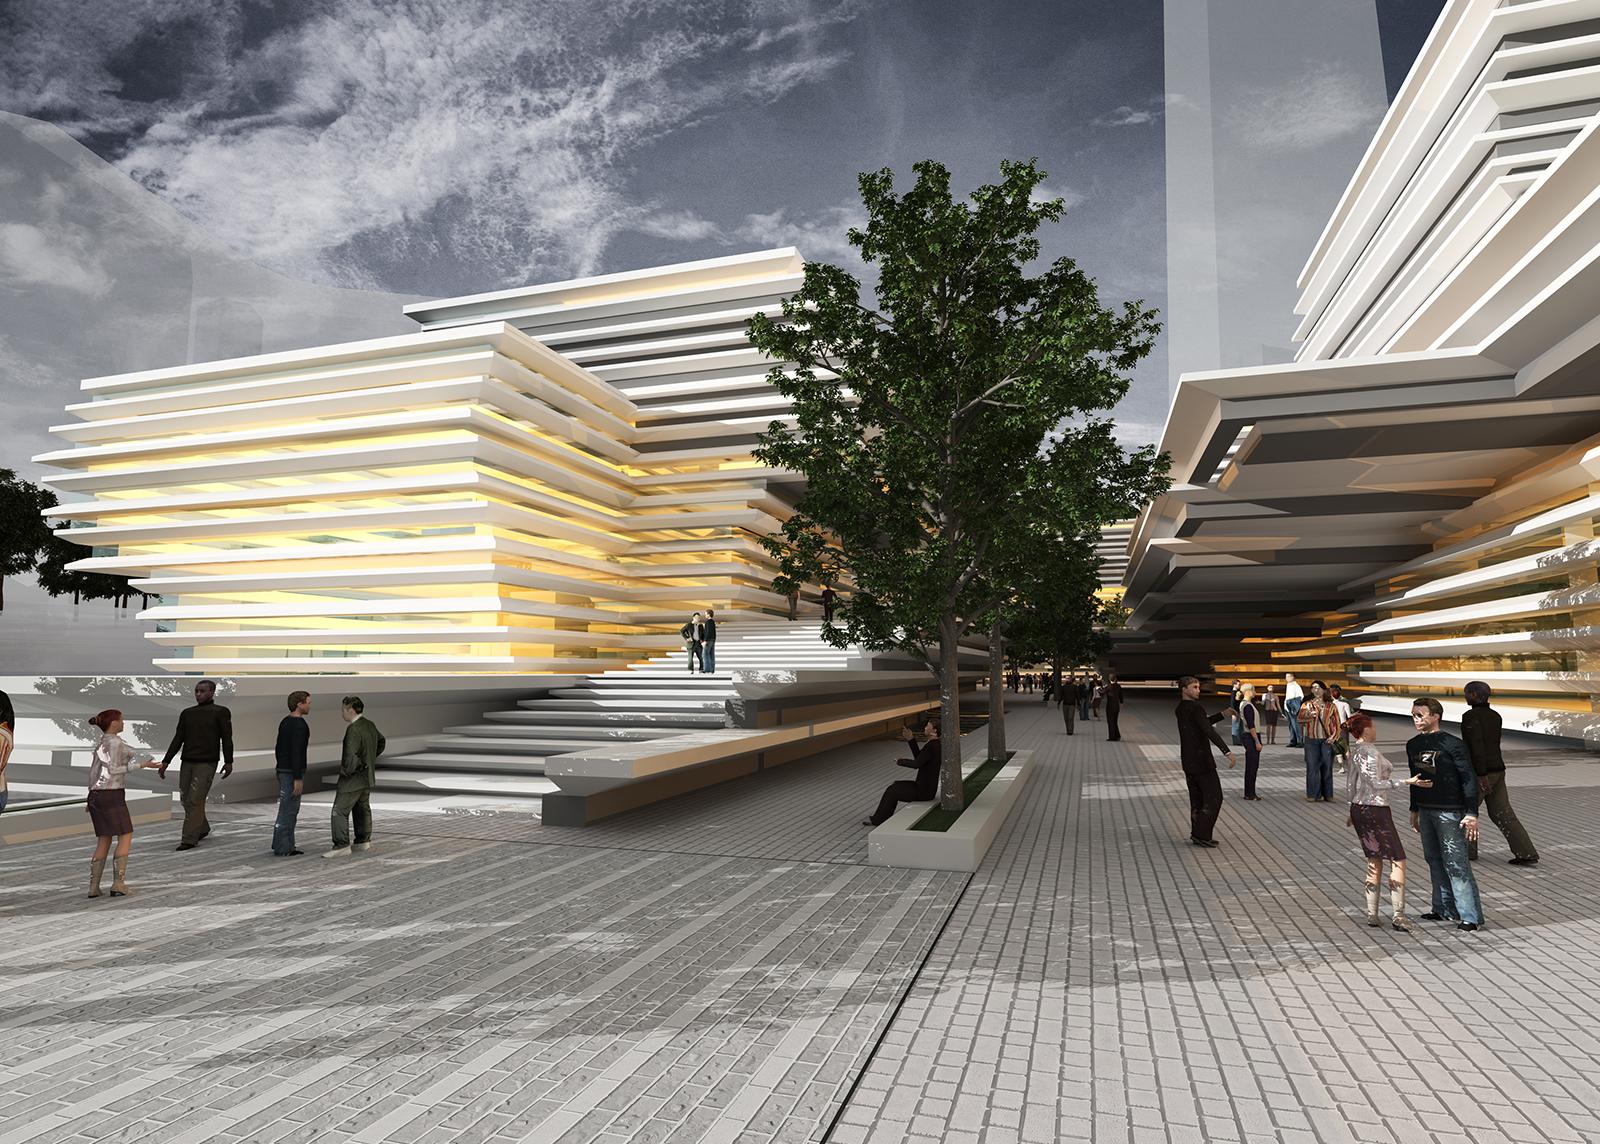 深圳海尚世界艺术中心_Shenzhen Sea World Culture Art Center_Left_01.jpg